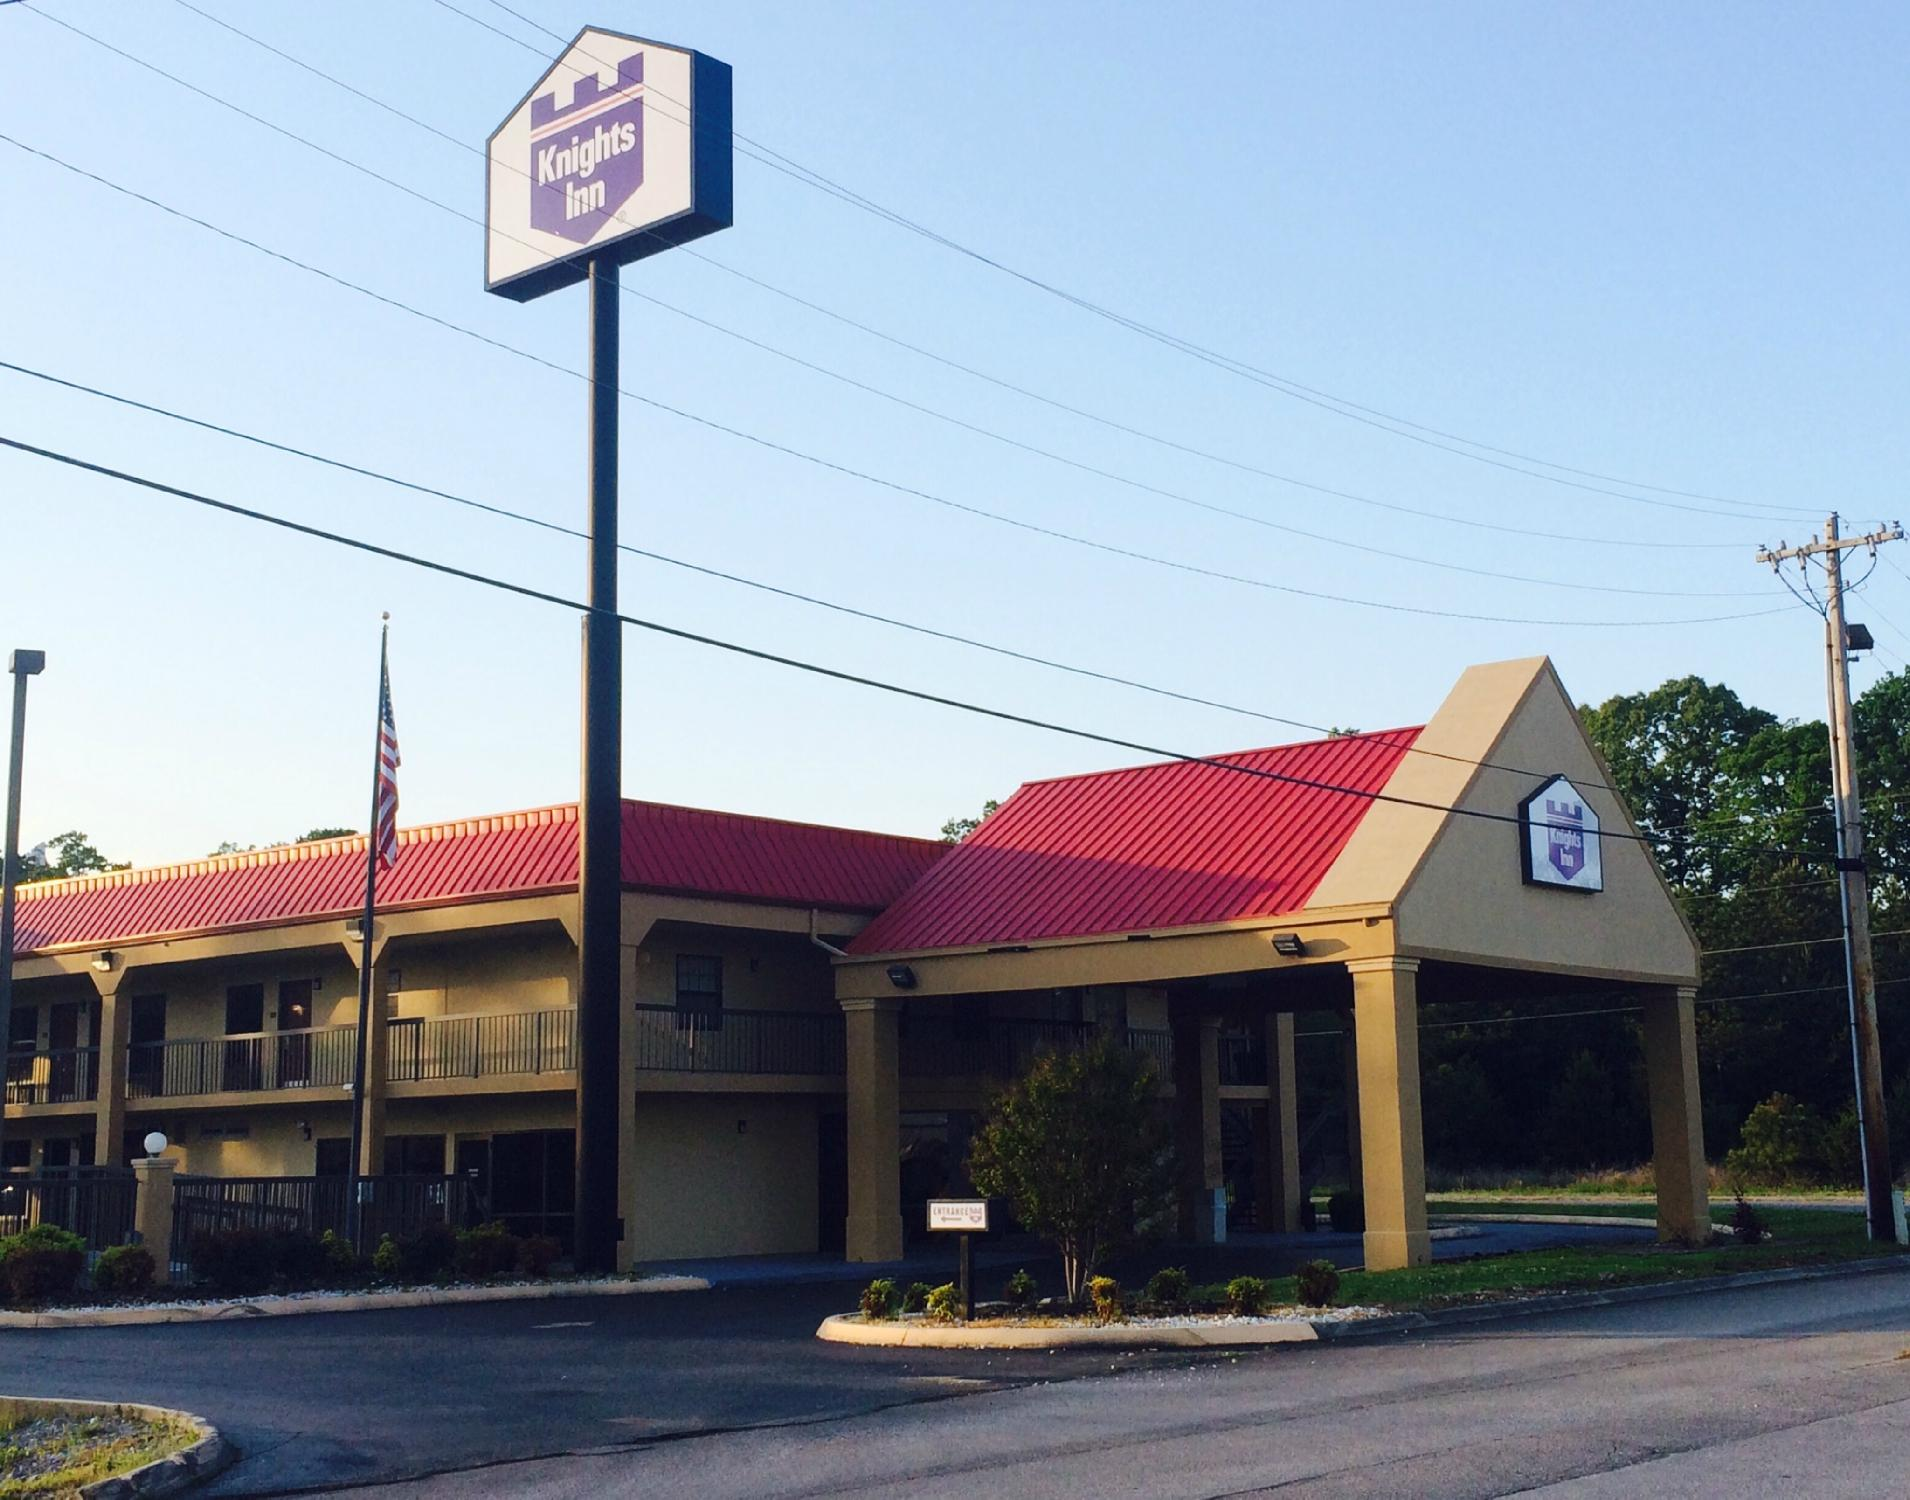 Knights Inn Knoxville/Lenoir City